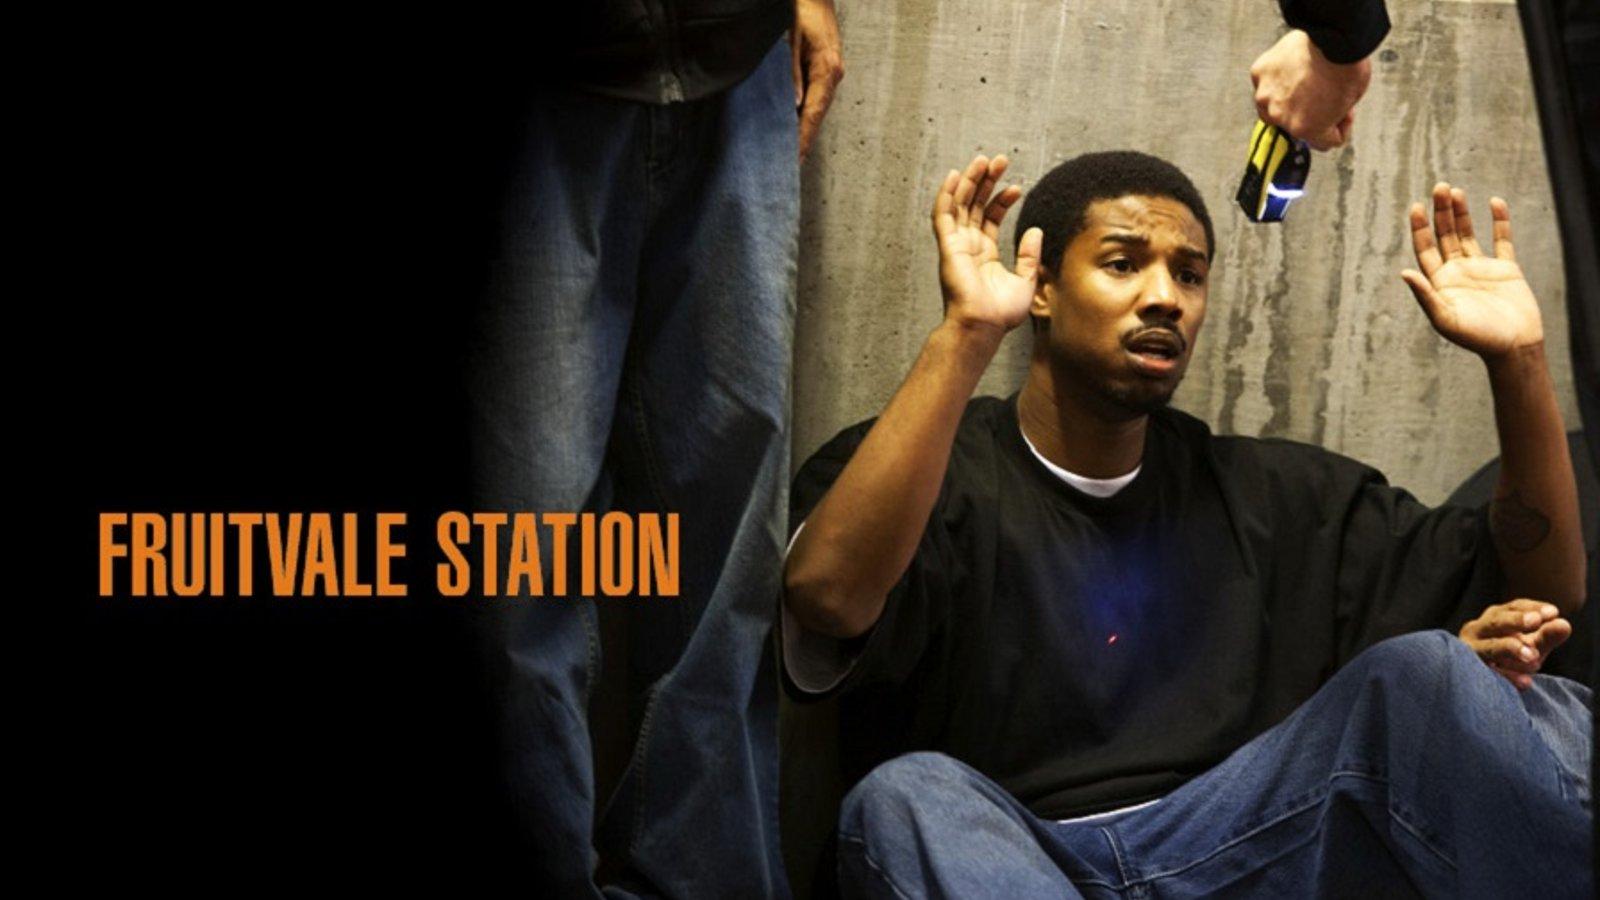 Fruitville Station